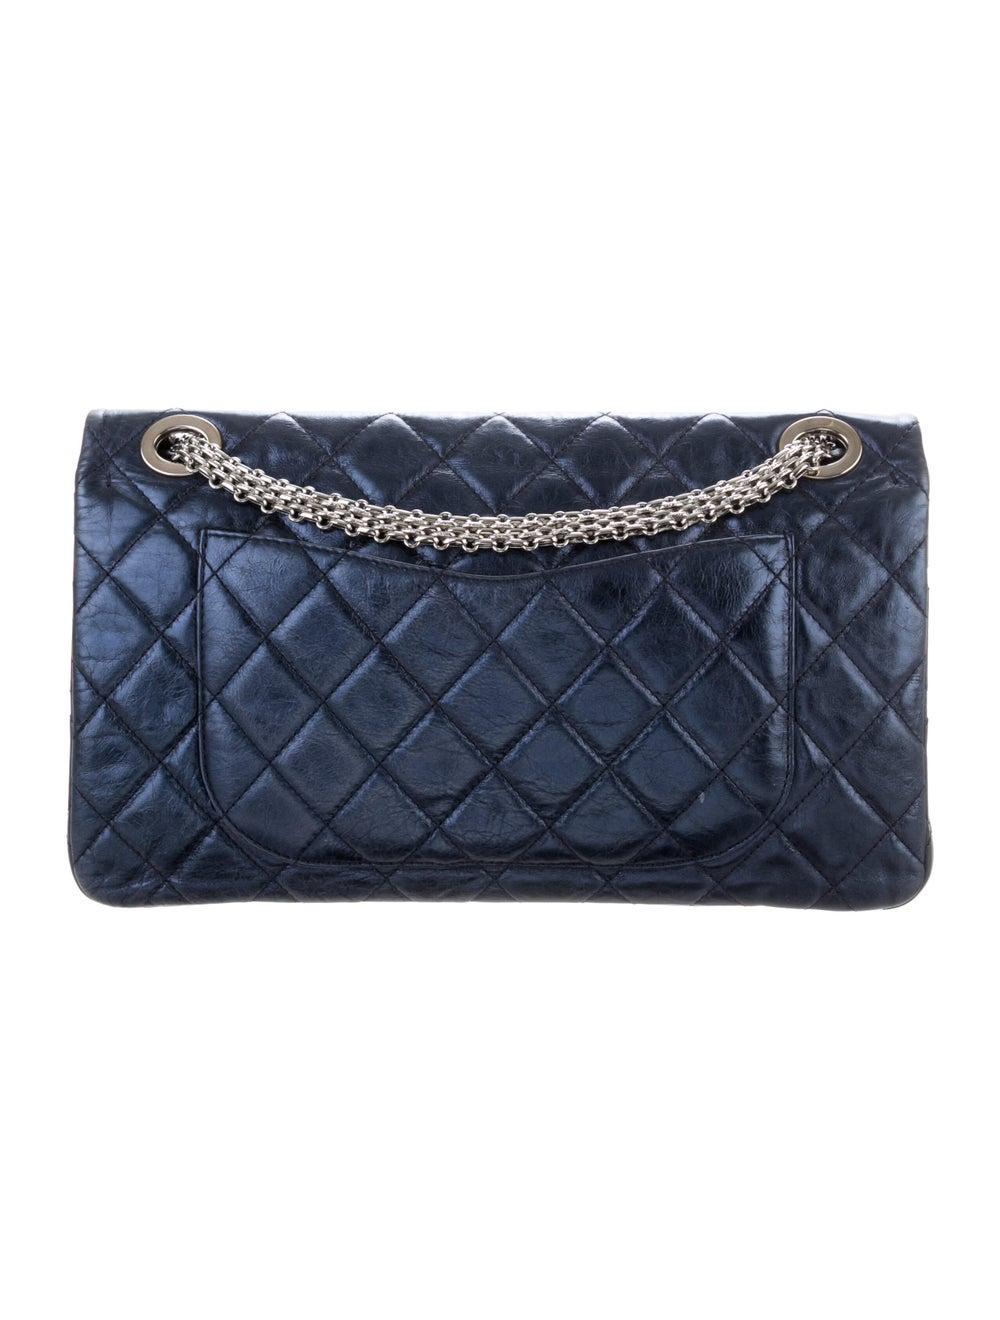 Chanel Reissue 2.55 Classic 227 Flap Bag Blue - image 4